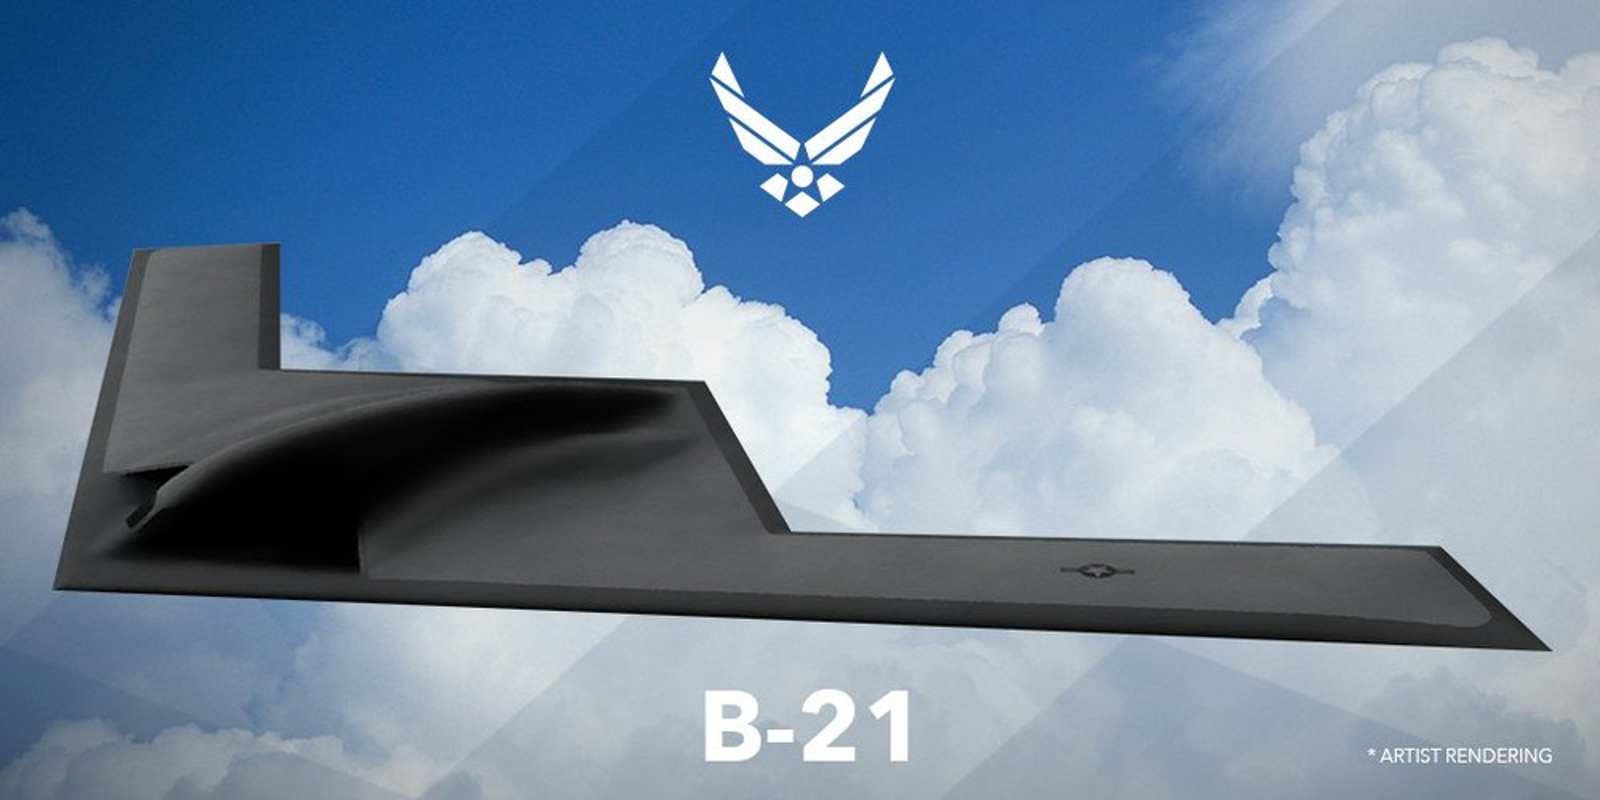 Choang: Oanh tac co B-21 Raider cua My co the khong chien nhu tiem kich-Hinh-6